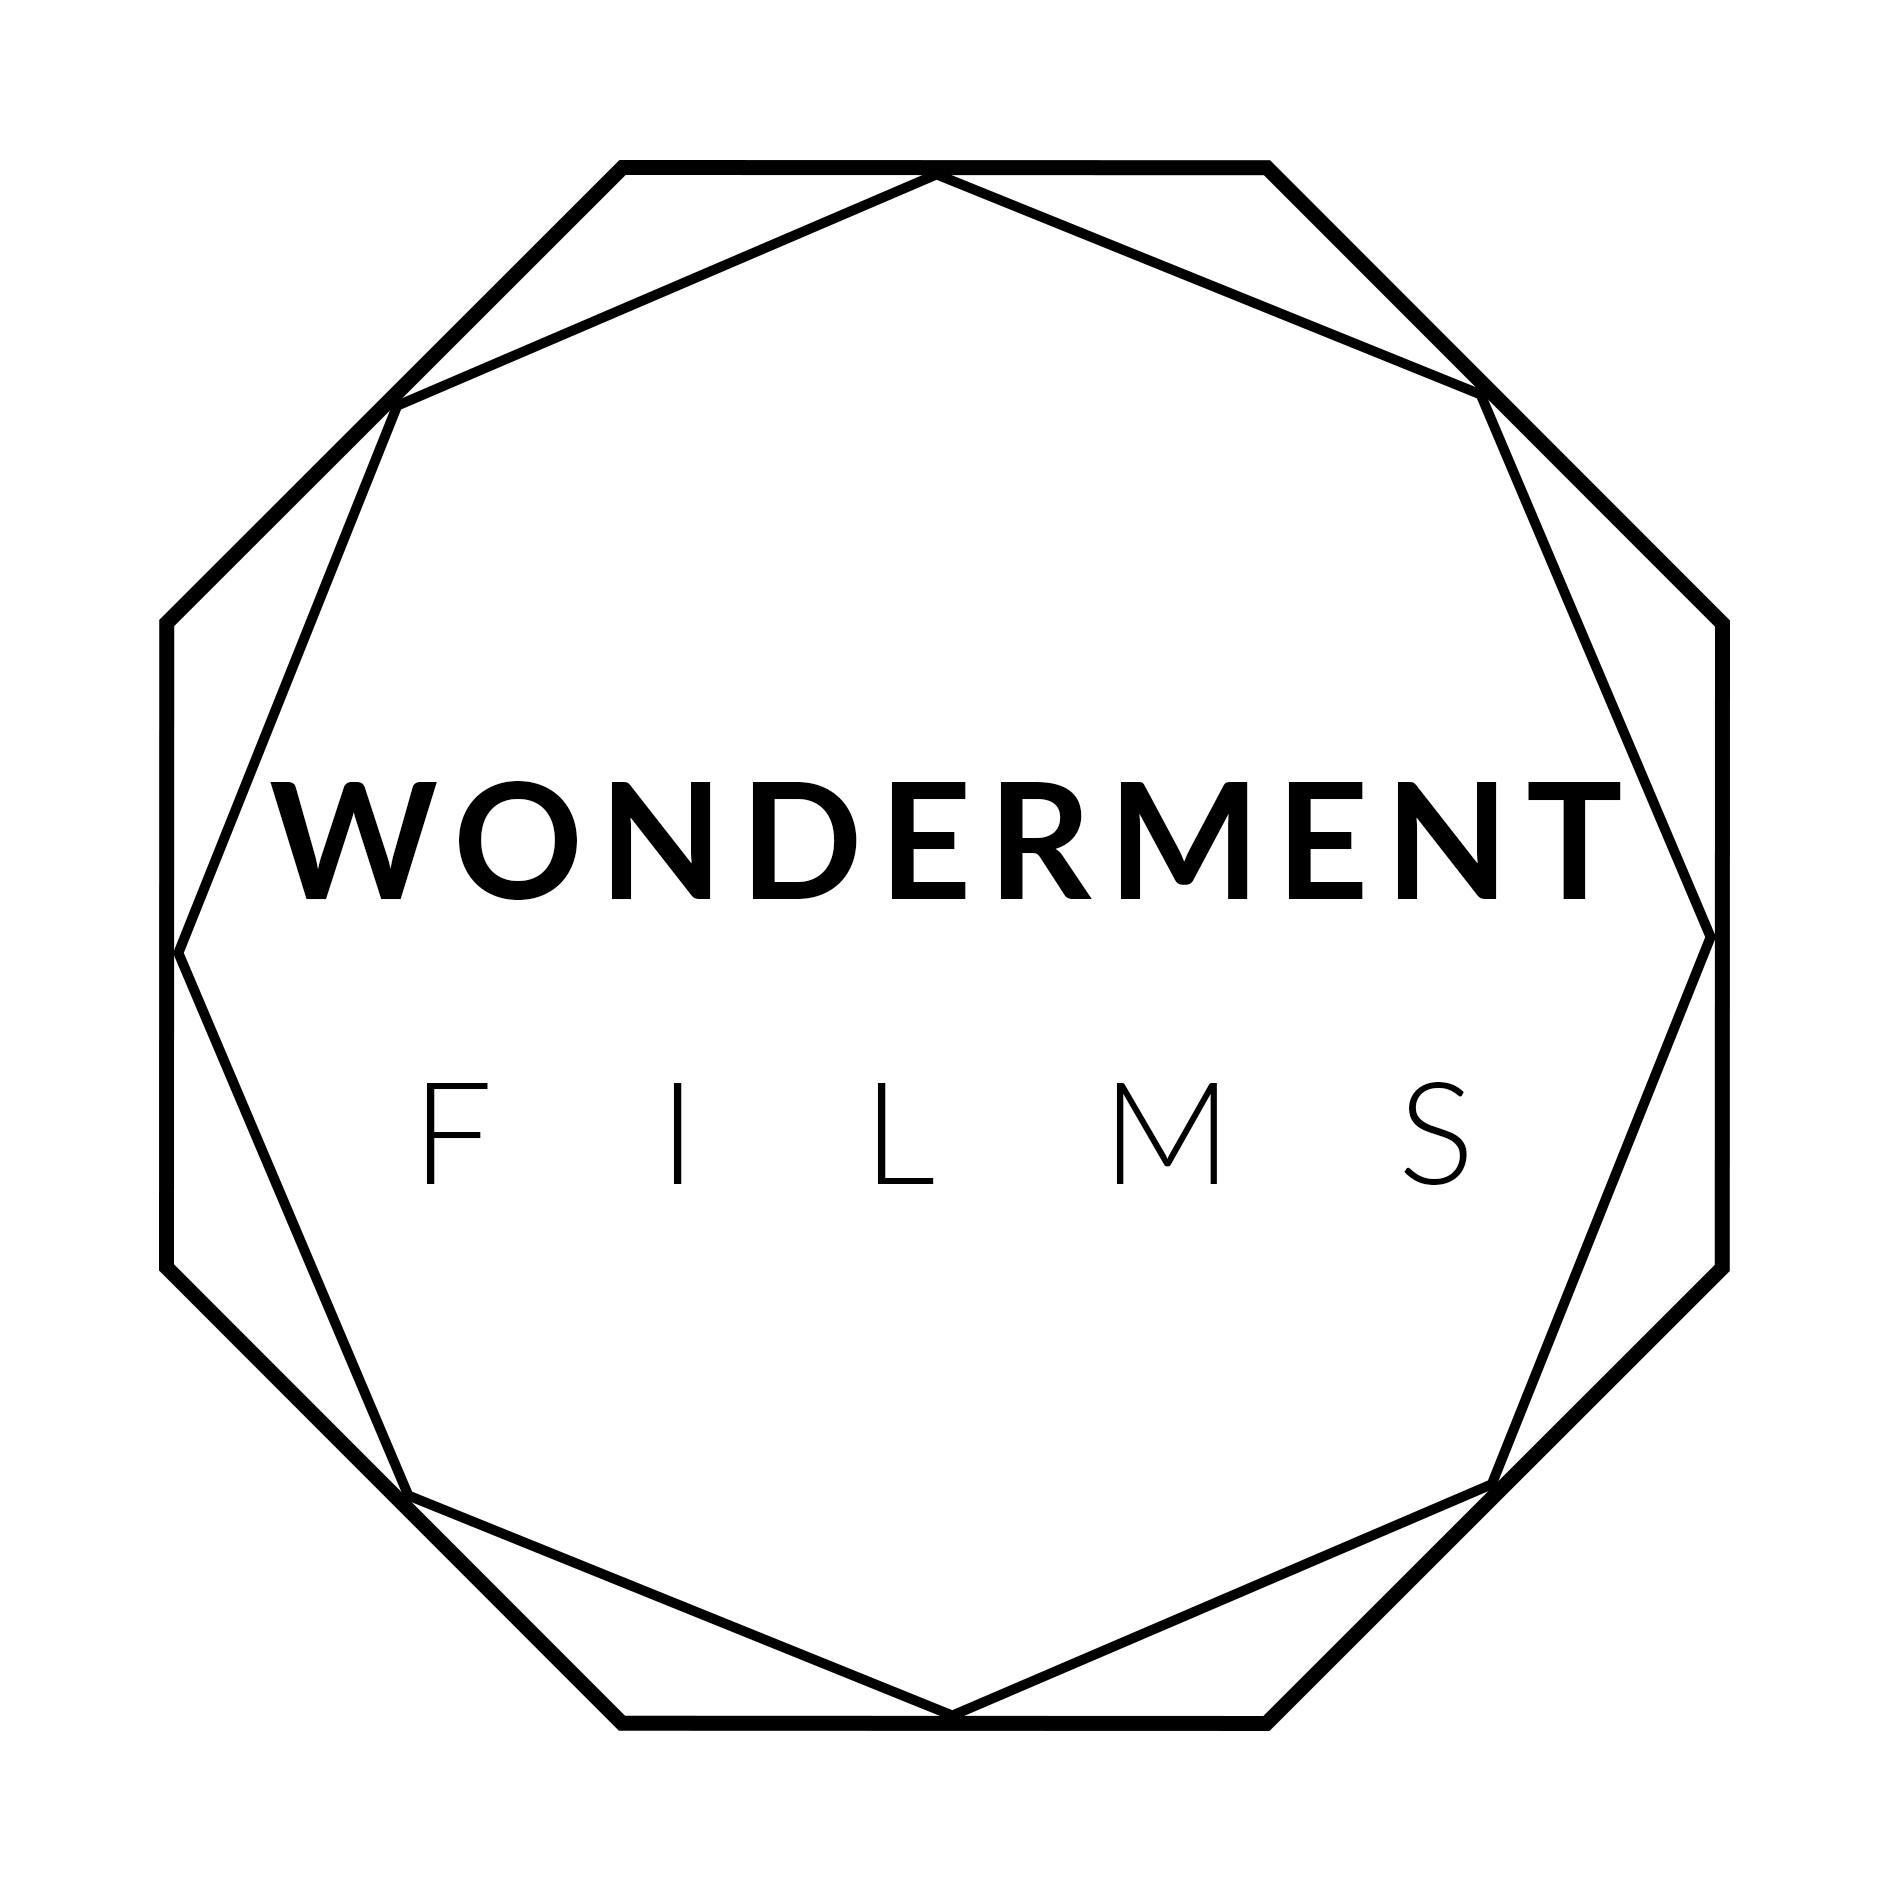 Wonderment Films Logo using coworking space